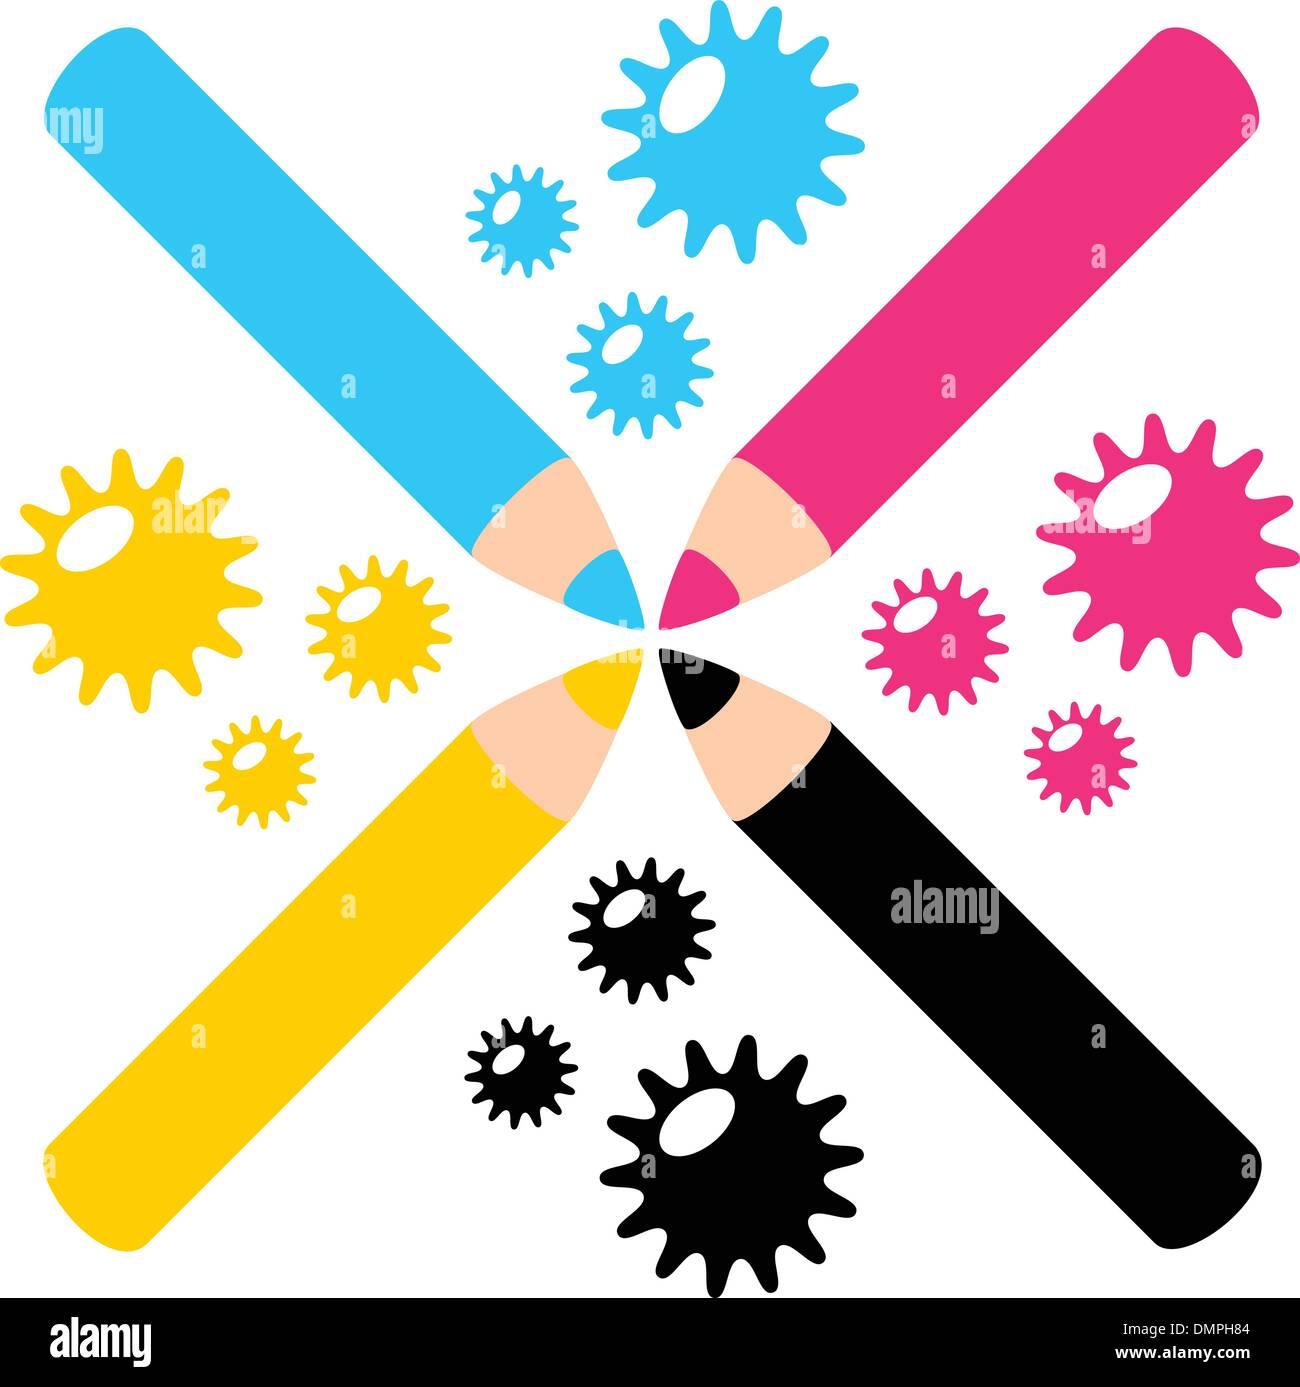 CMYK color color pencil illustration - Stock Image